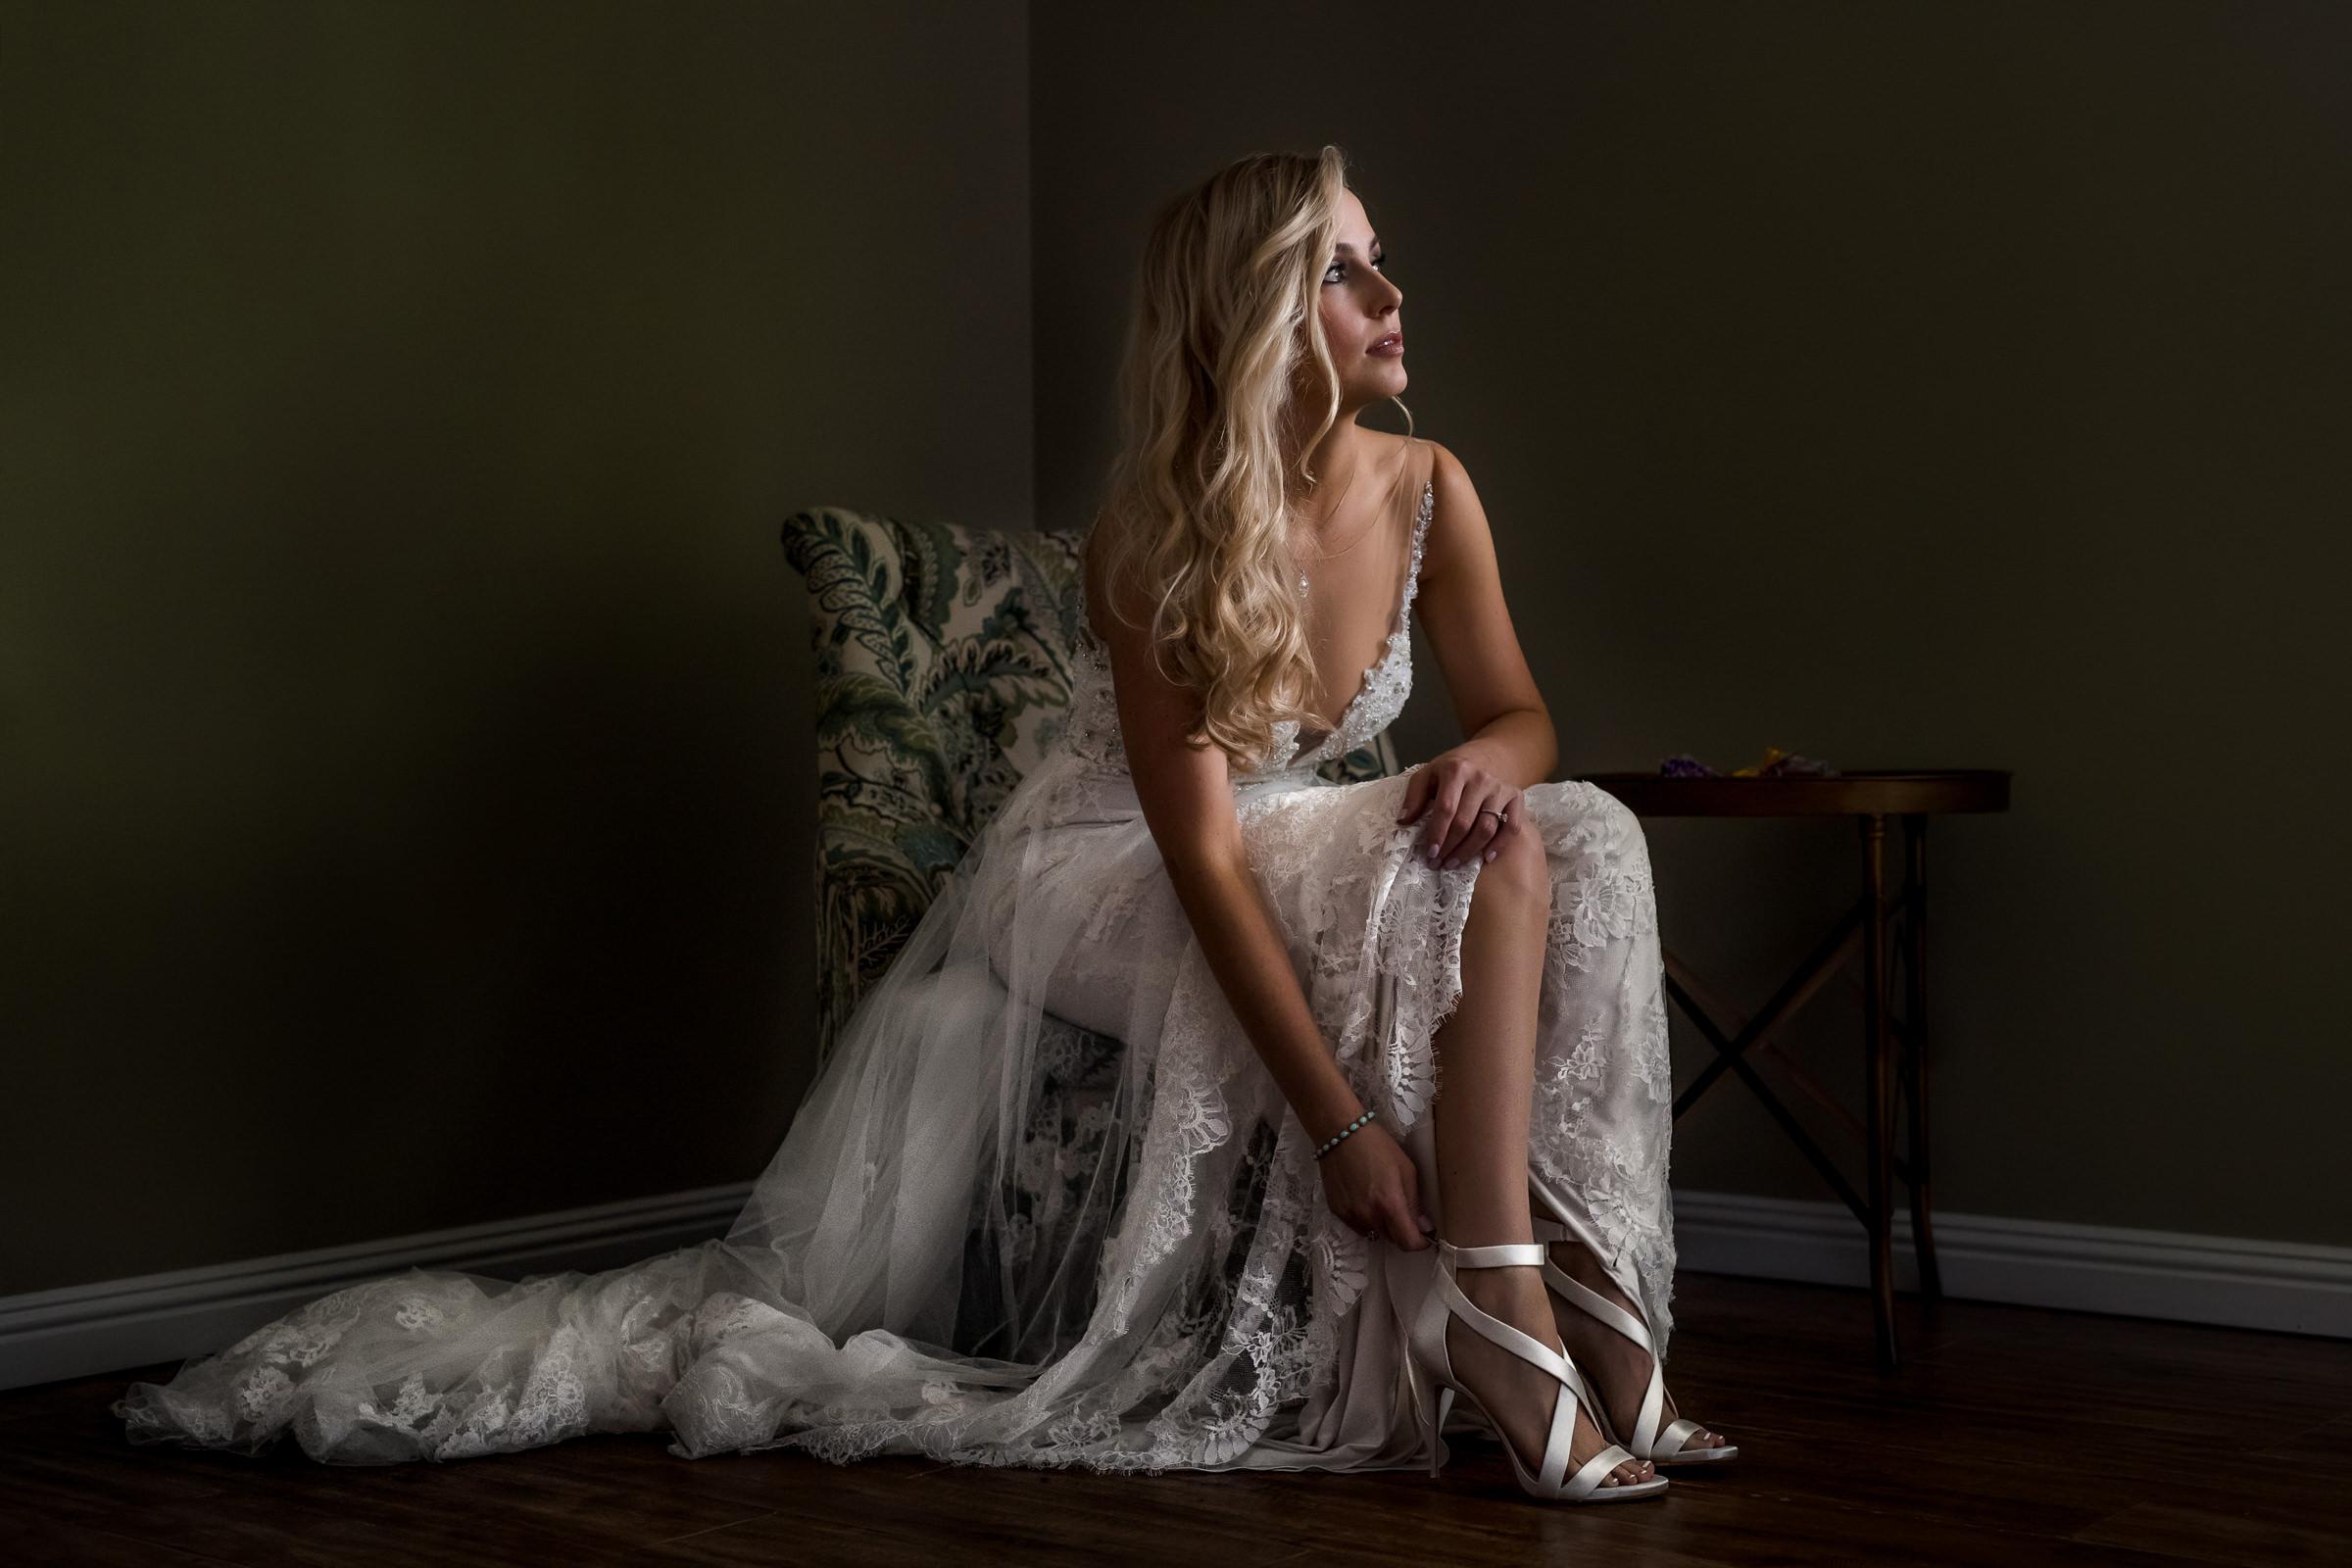 blond-bride-tying-up-her-satin-sandals-mhart-los-angeles-photographer